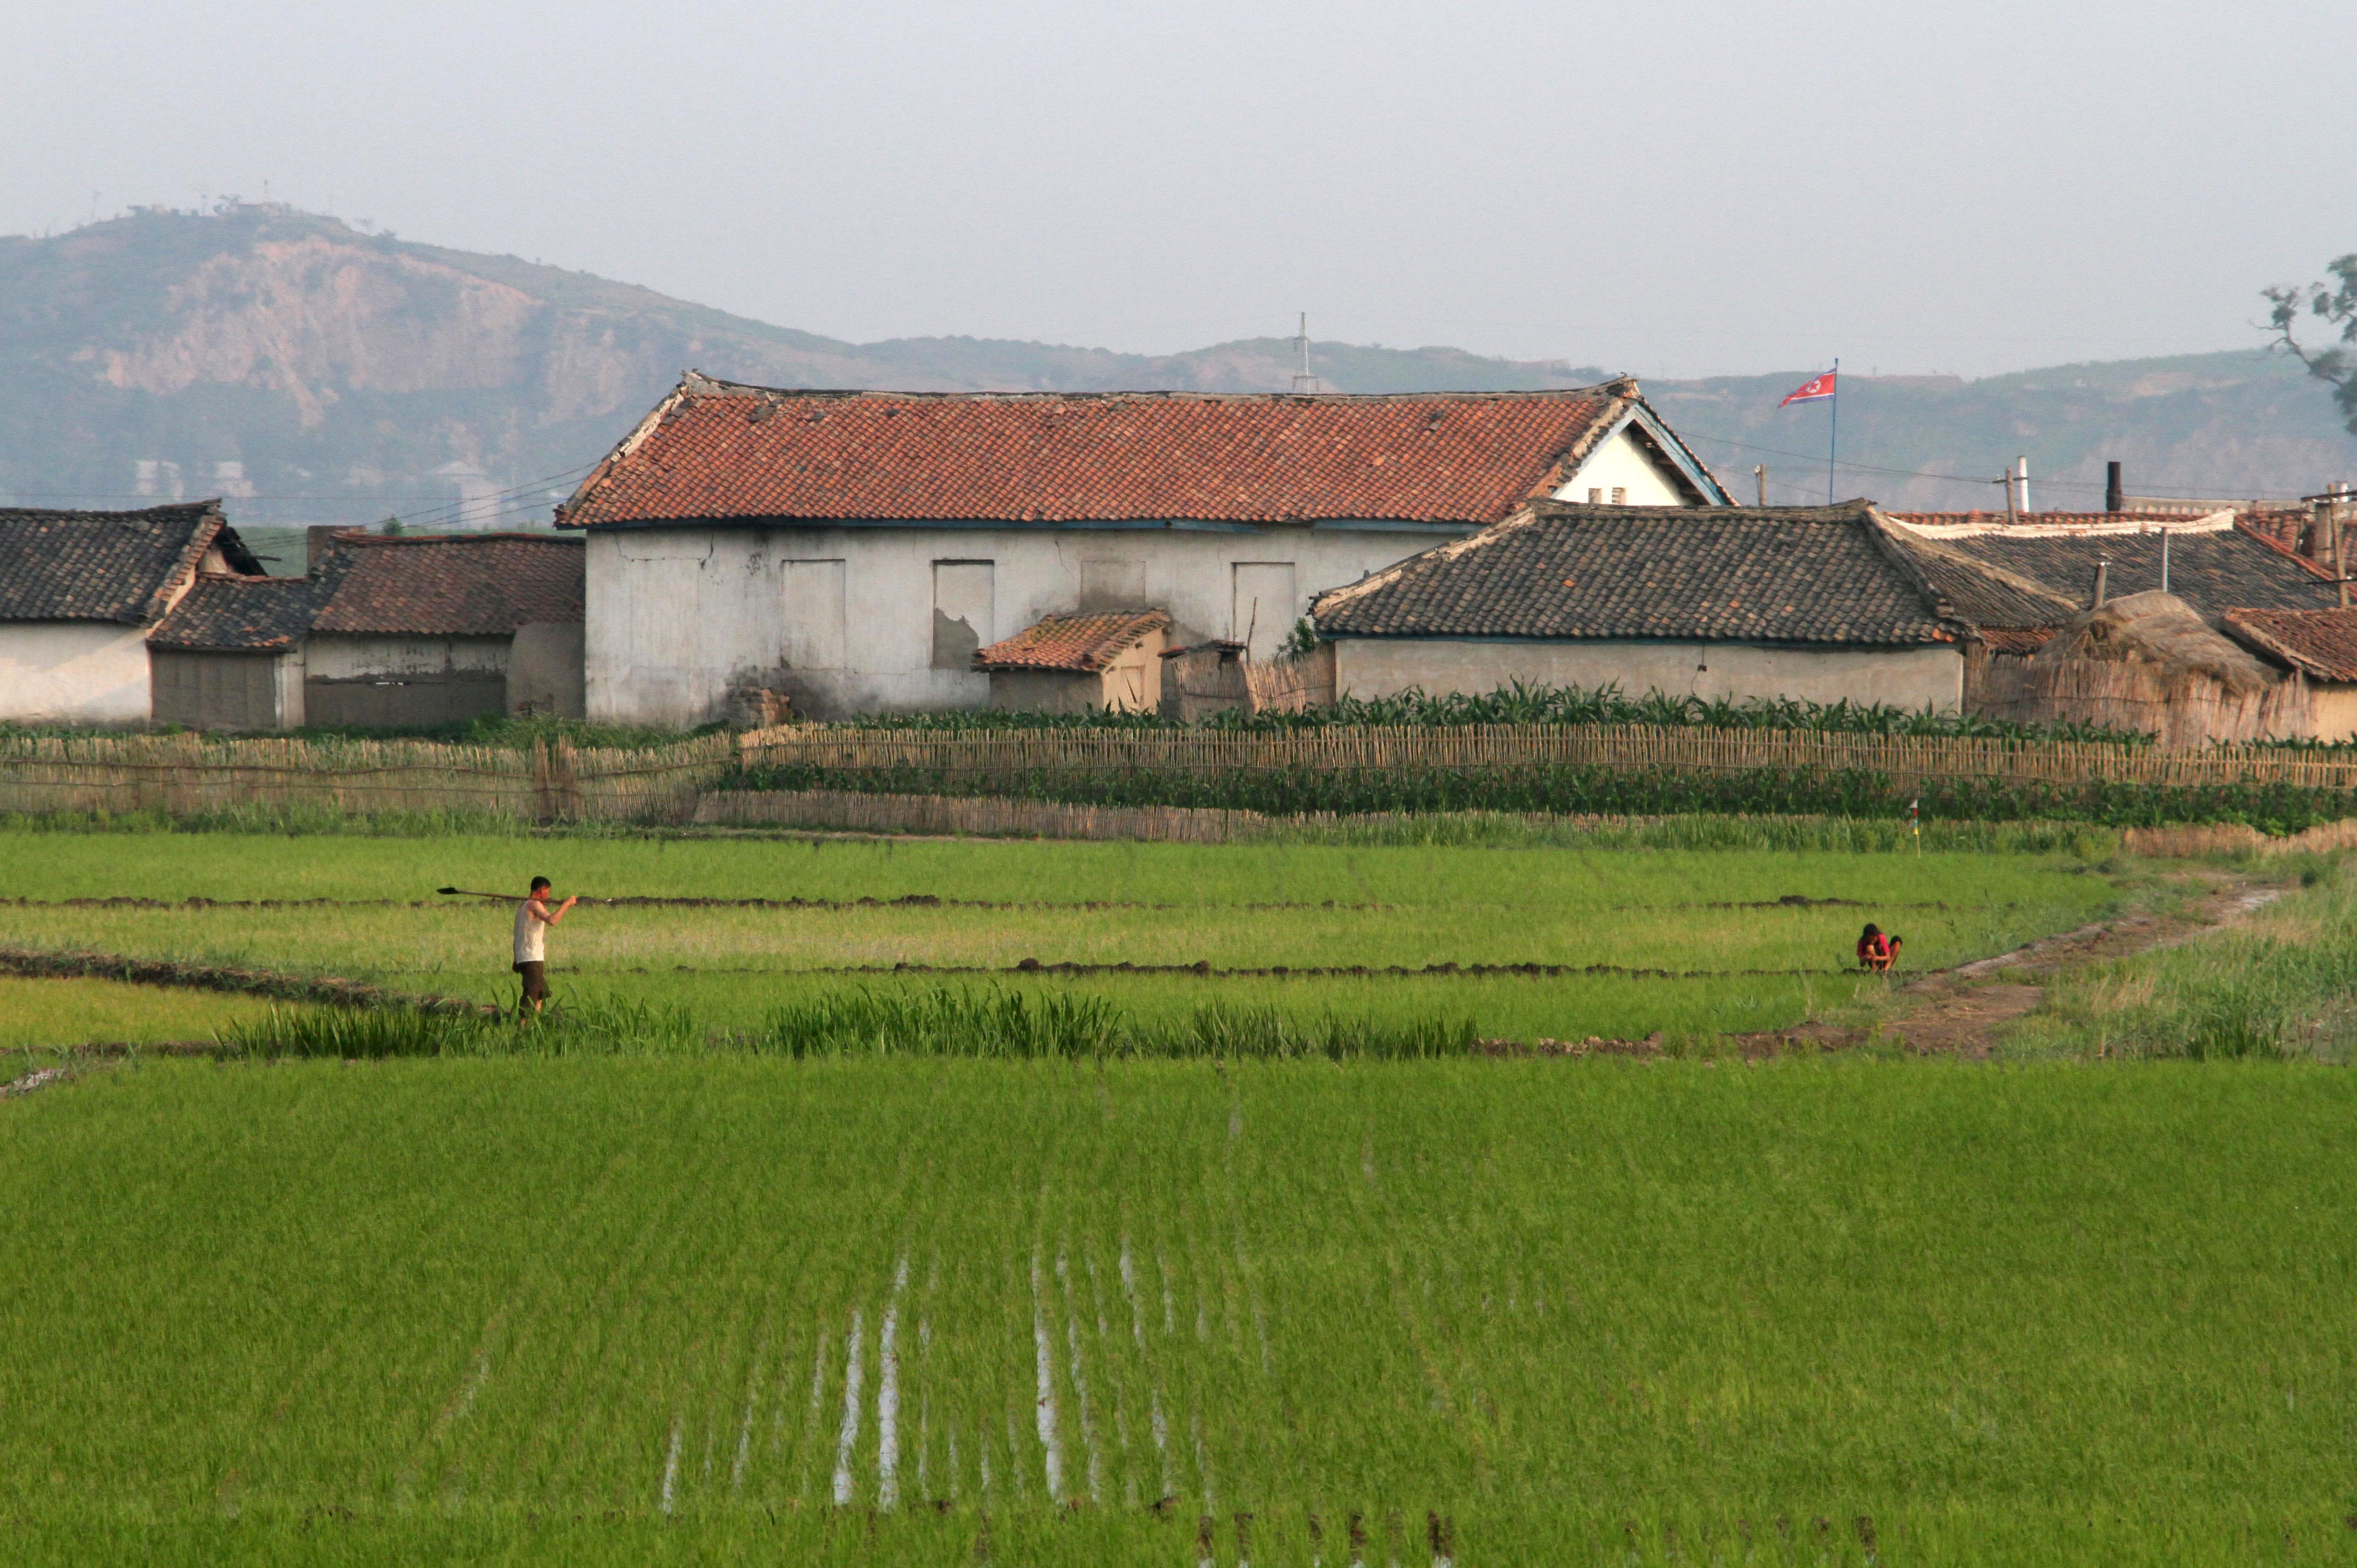 North Korea warns of food crisis, slashes rations before next leaders' summit